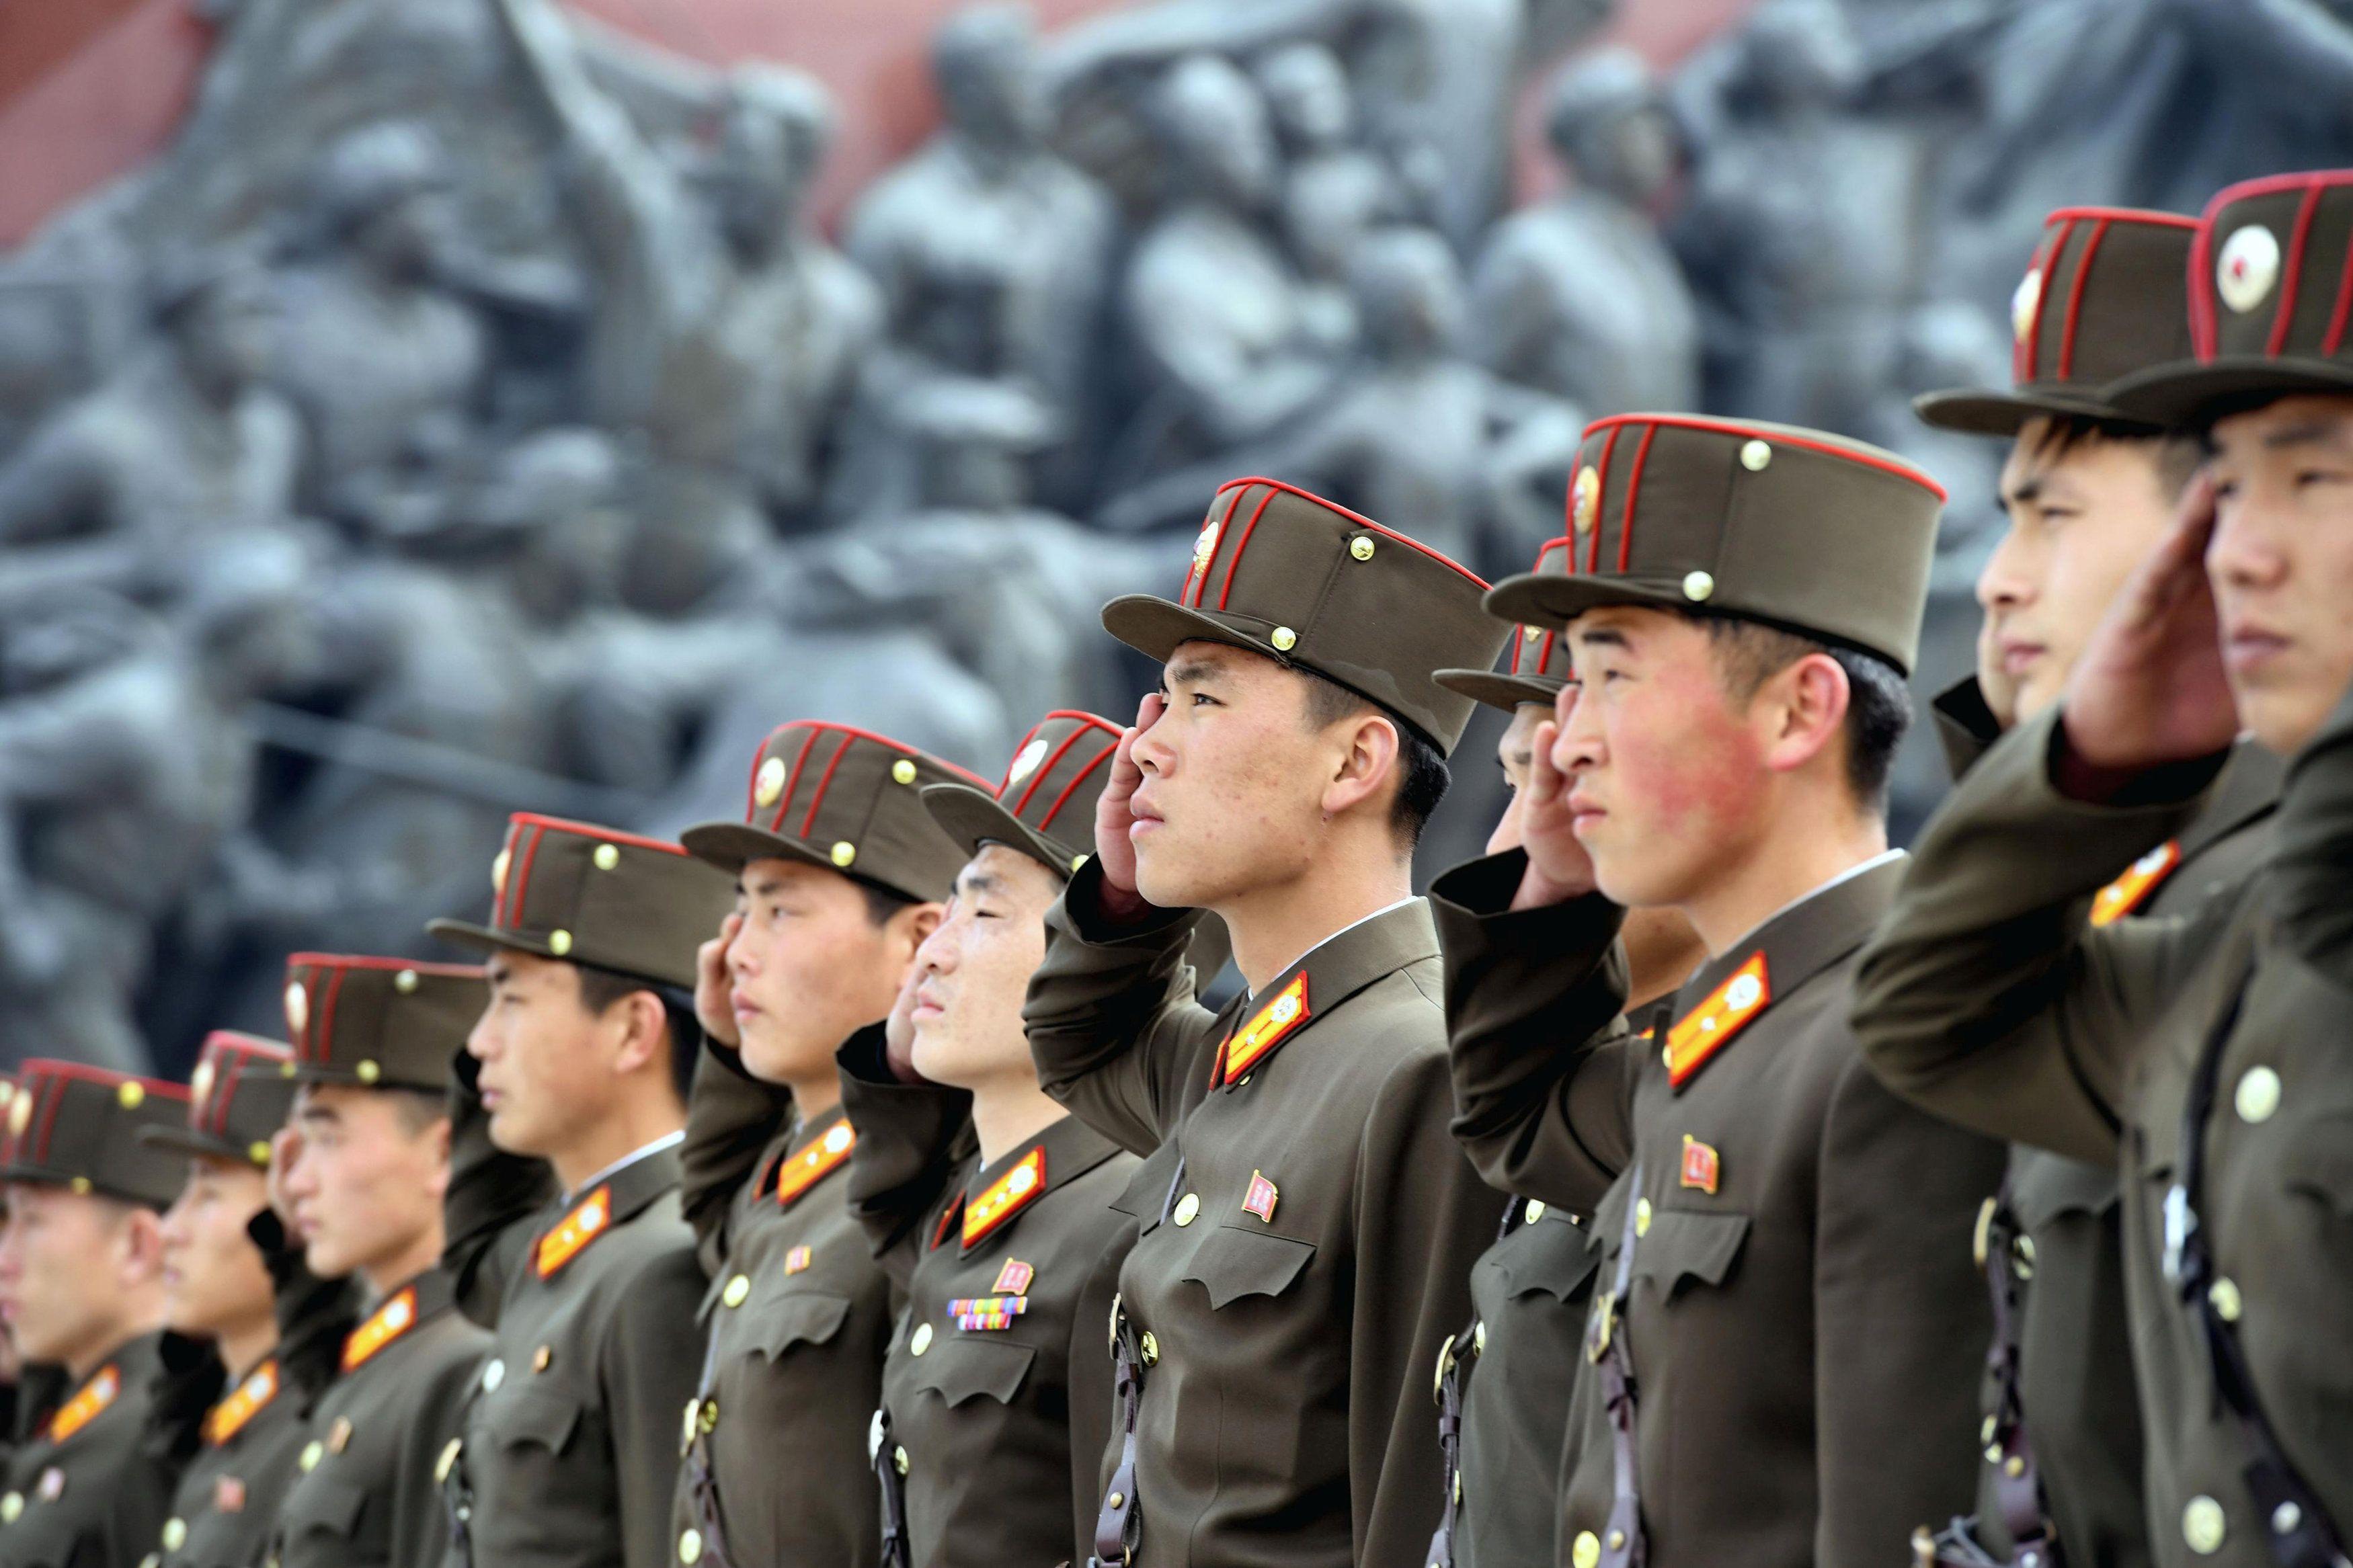 Солдаты КНДР, иллюстрация